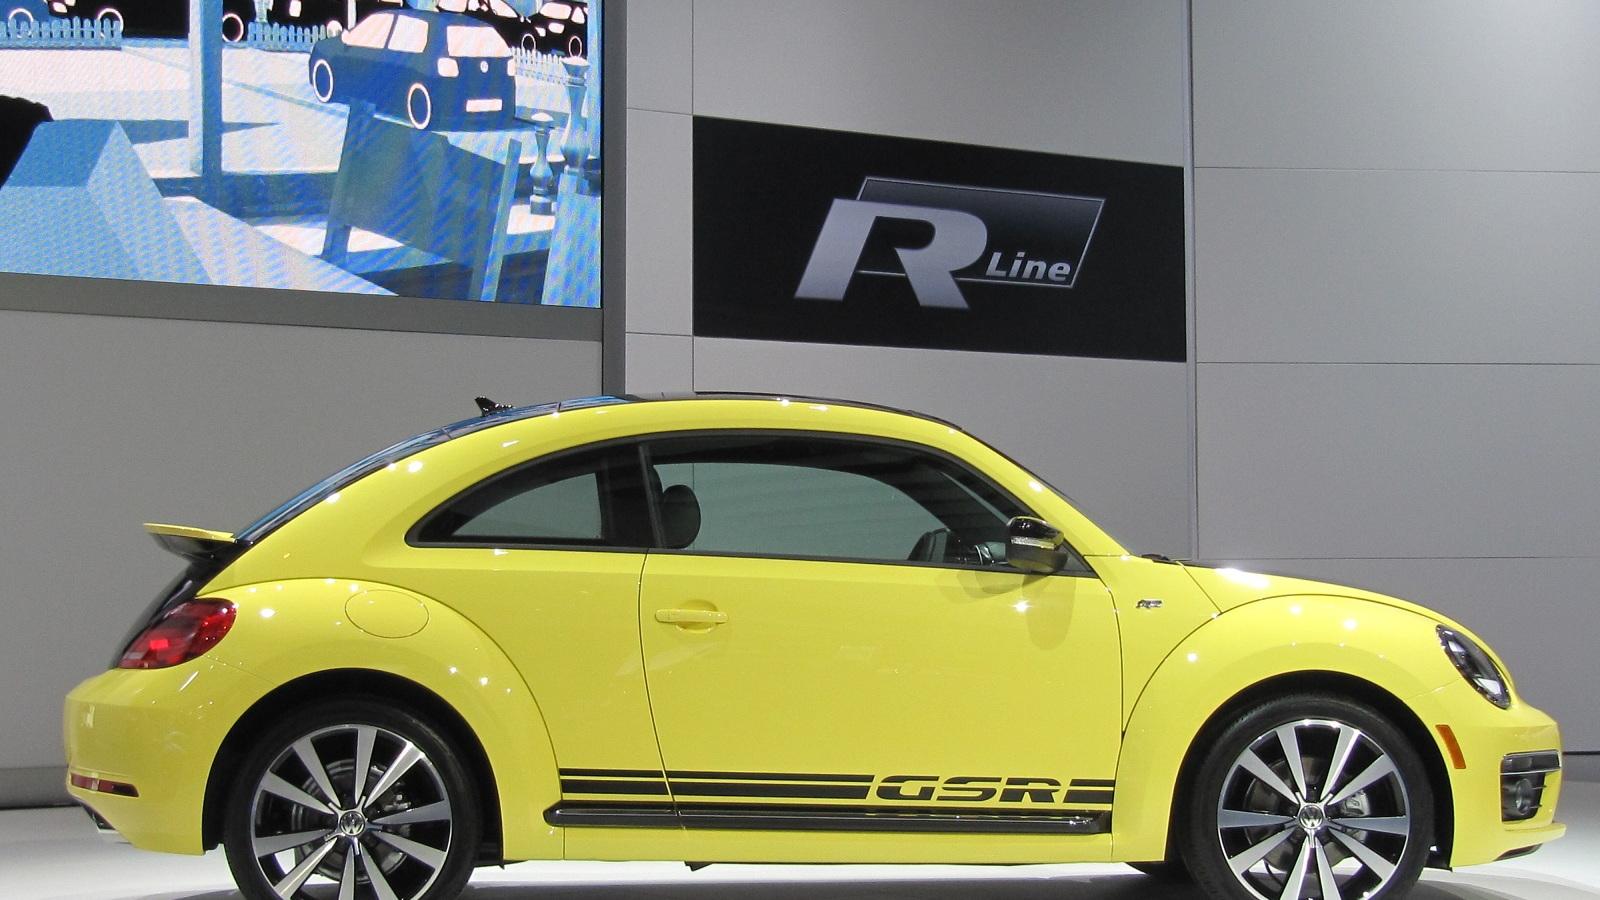 Volkswagen Beetle GSR, 2013 Chicago Auto Show